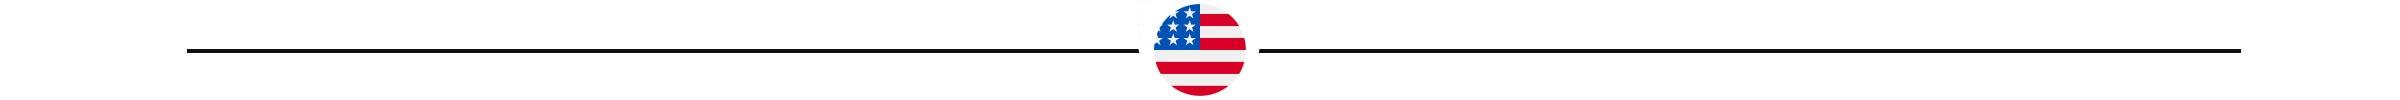 American flag icon with black border